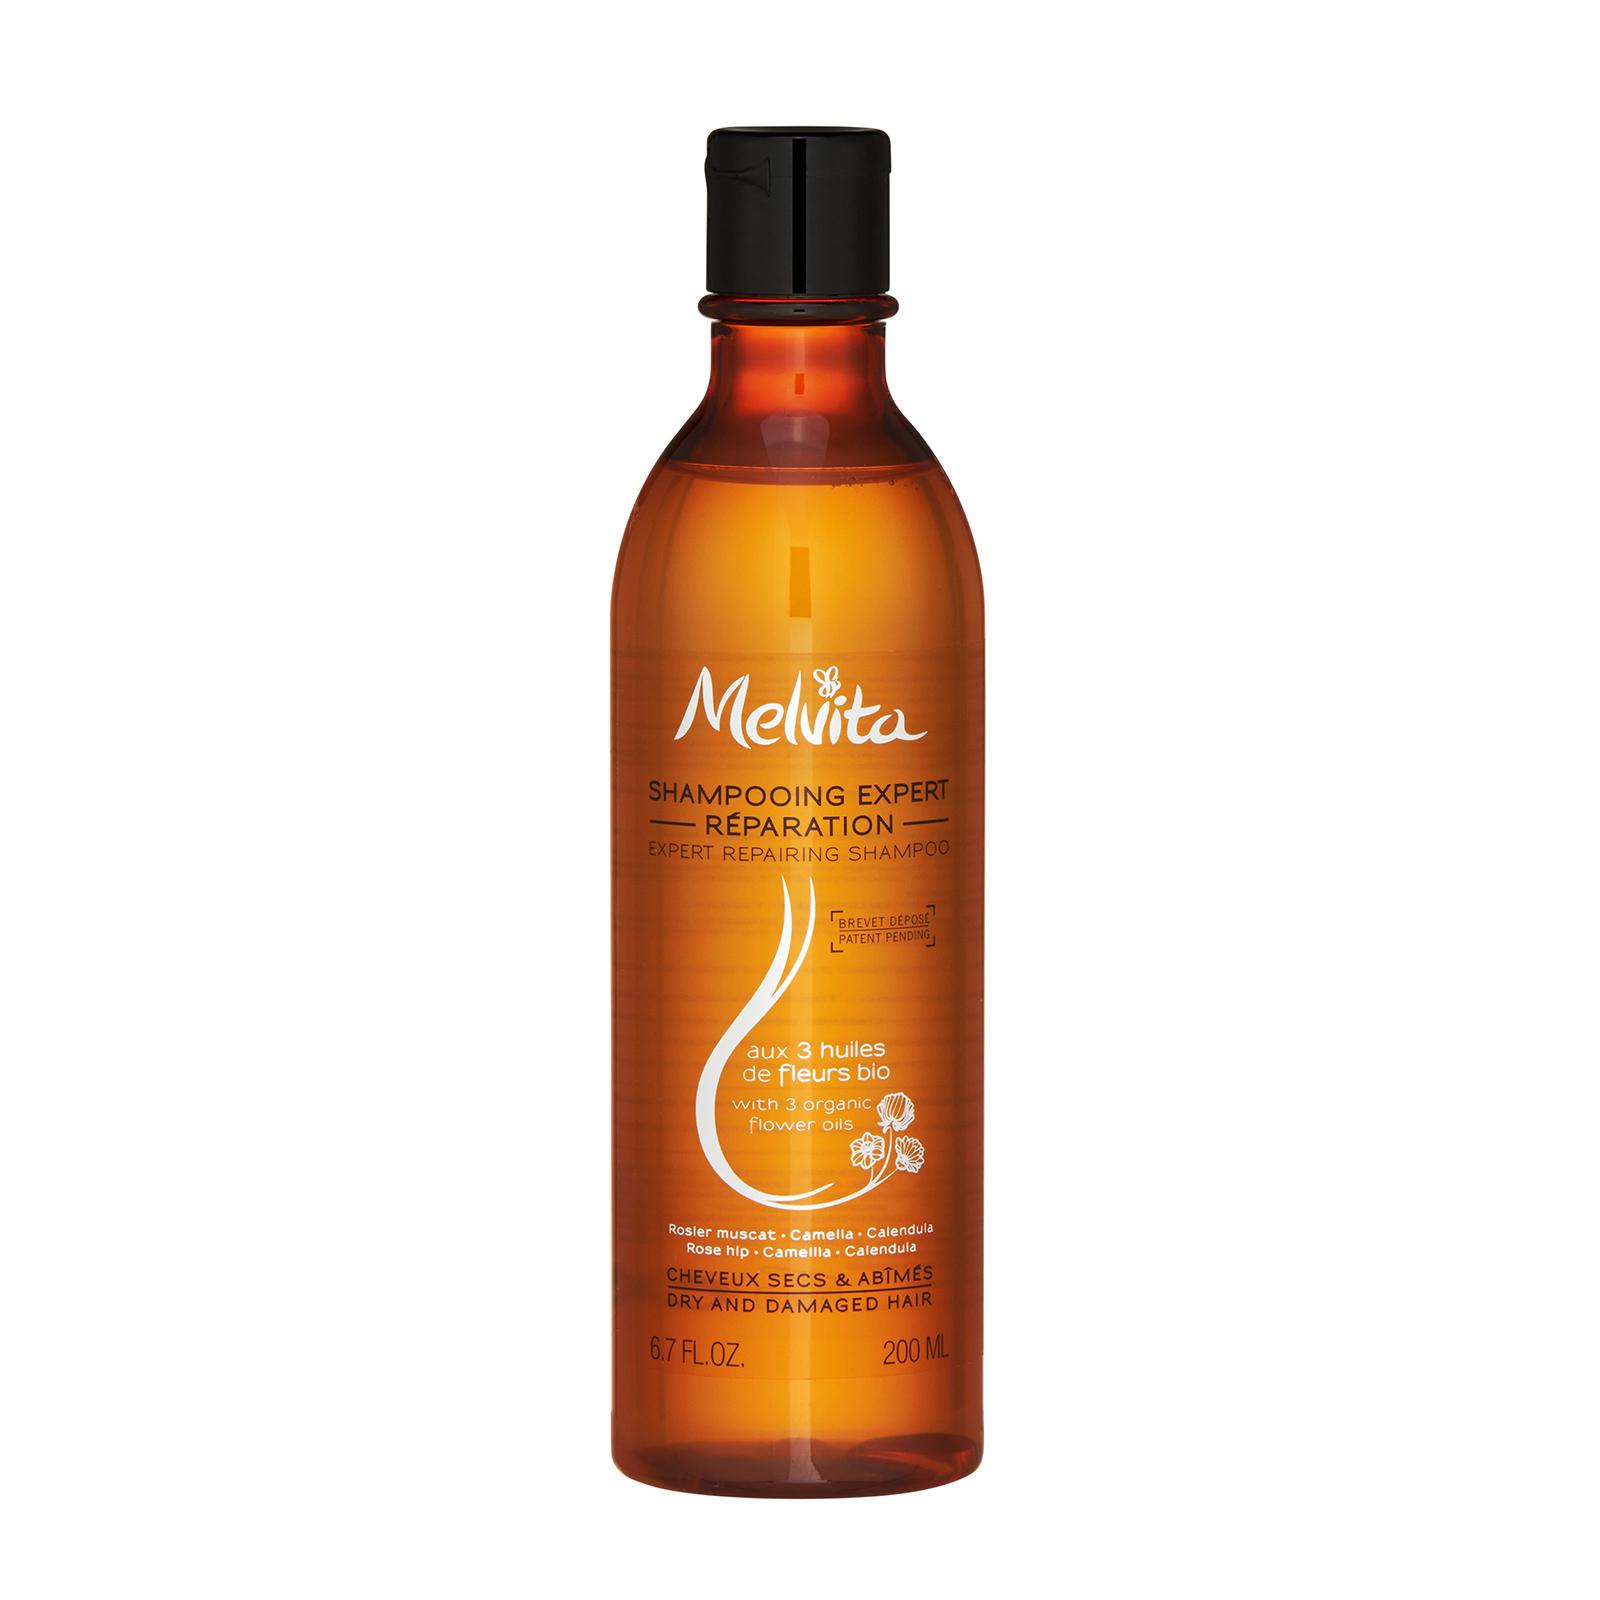 Melvita  Expert Repairing Shampoo (For Dry and Damaged Hair) 6.7oz, 200ml